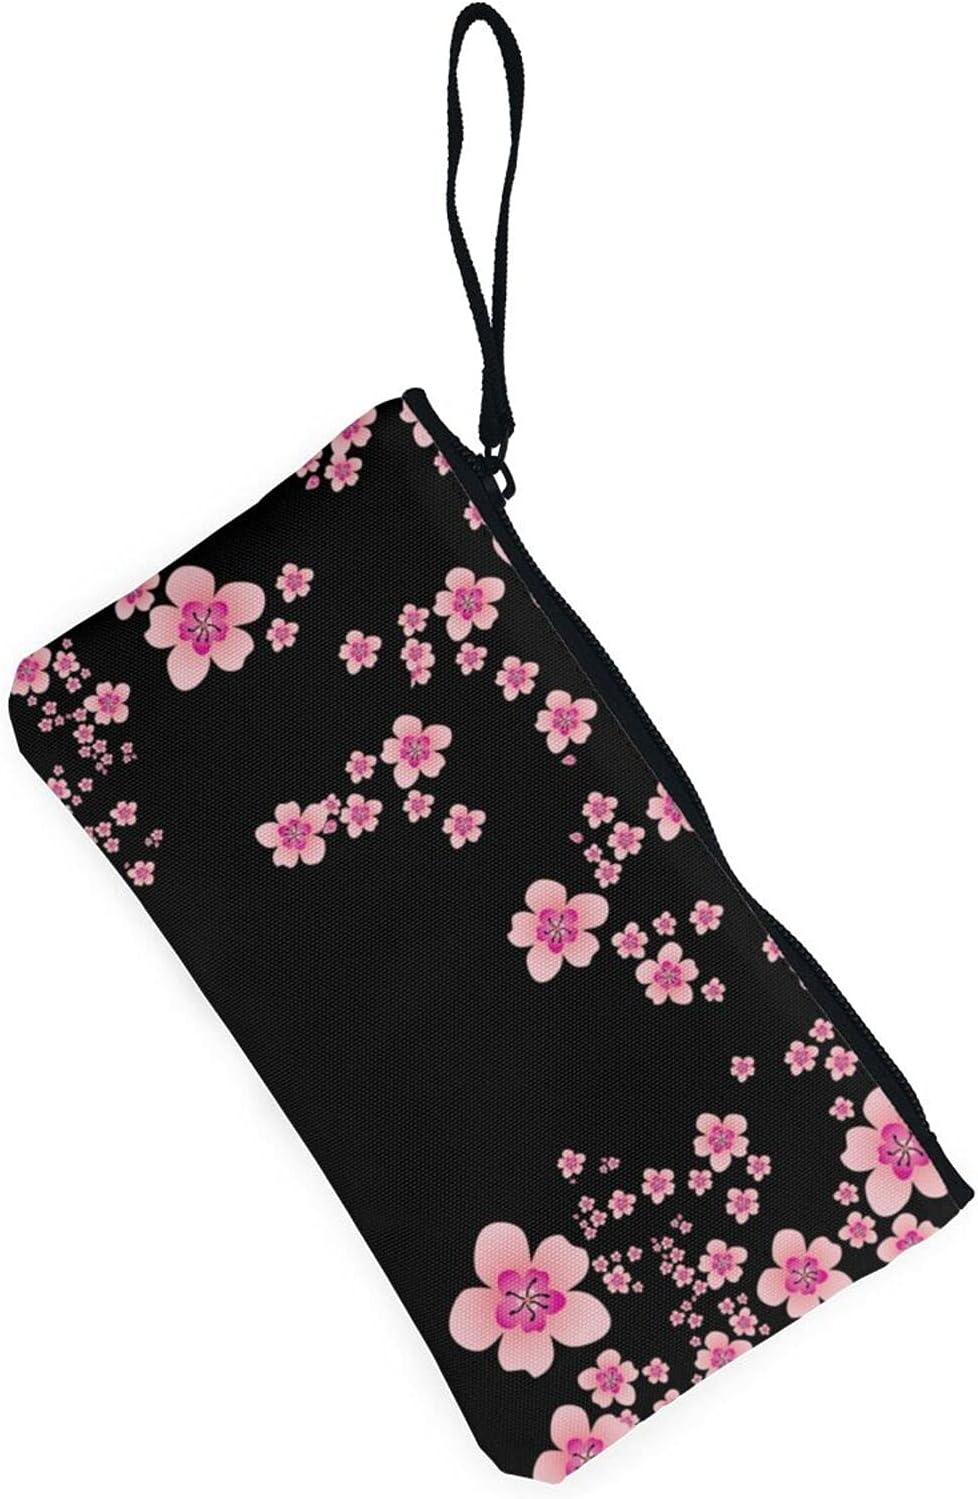 AORRUAM Plum blossom Canvas Coin Purse,Canvas Zipper Pencil Cases,Canvas Change Purse Pouch Mini Wallet Coin Bag